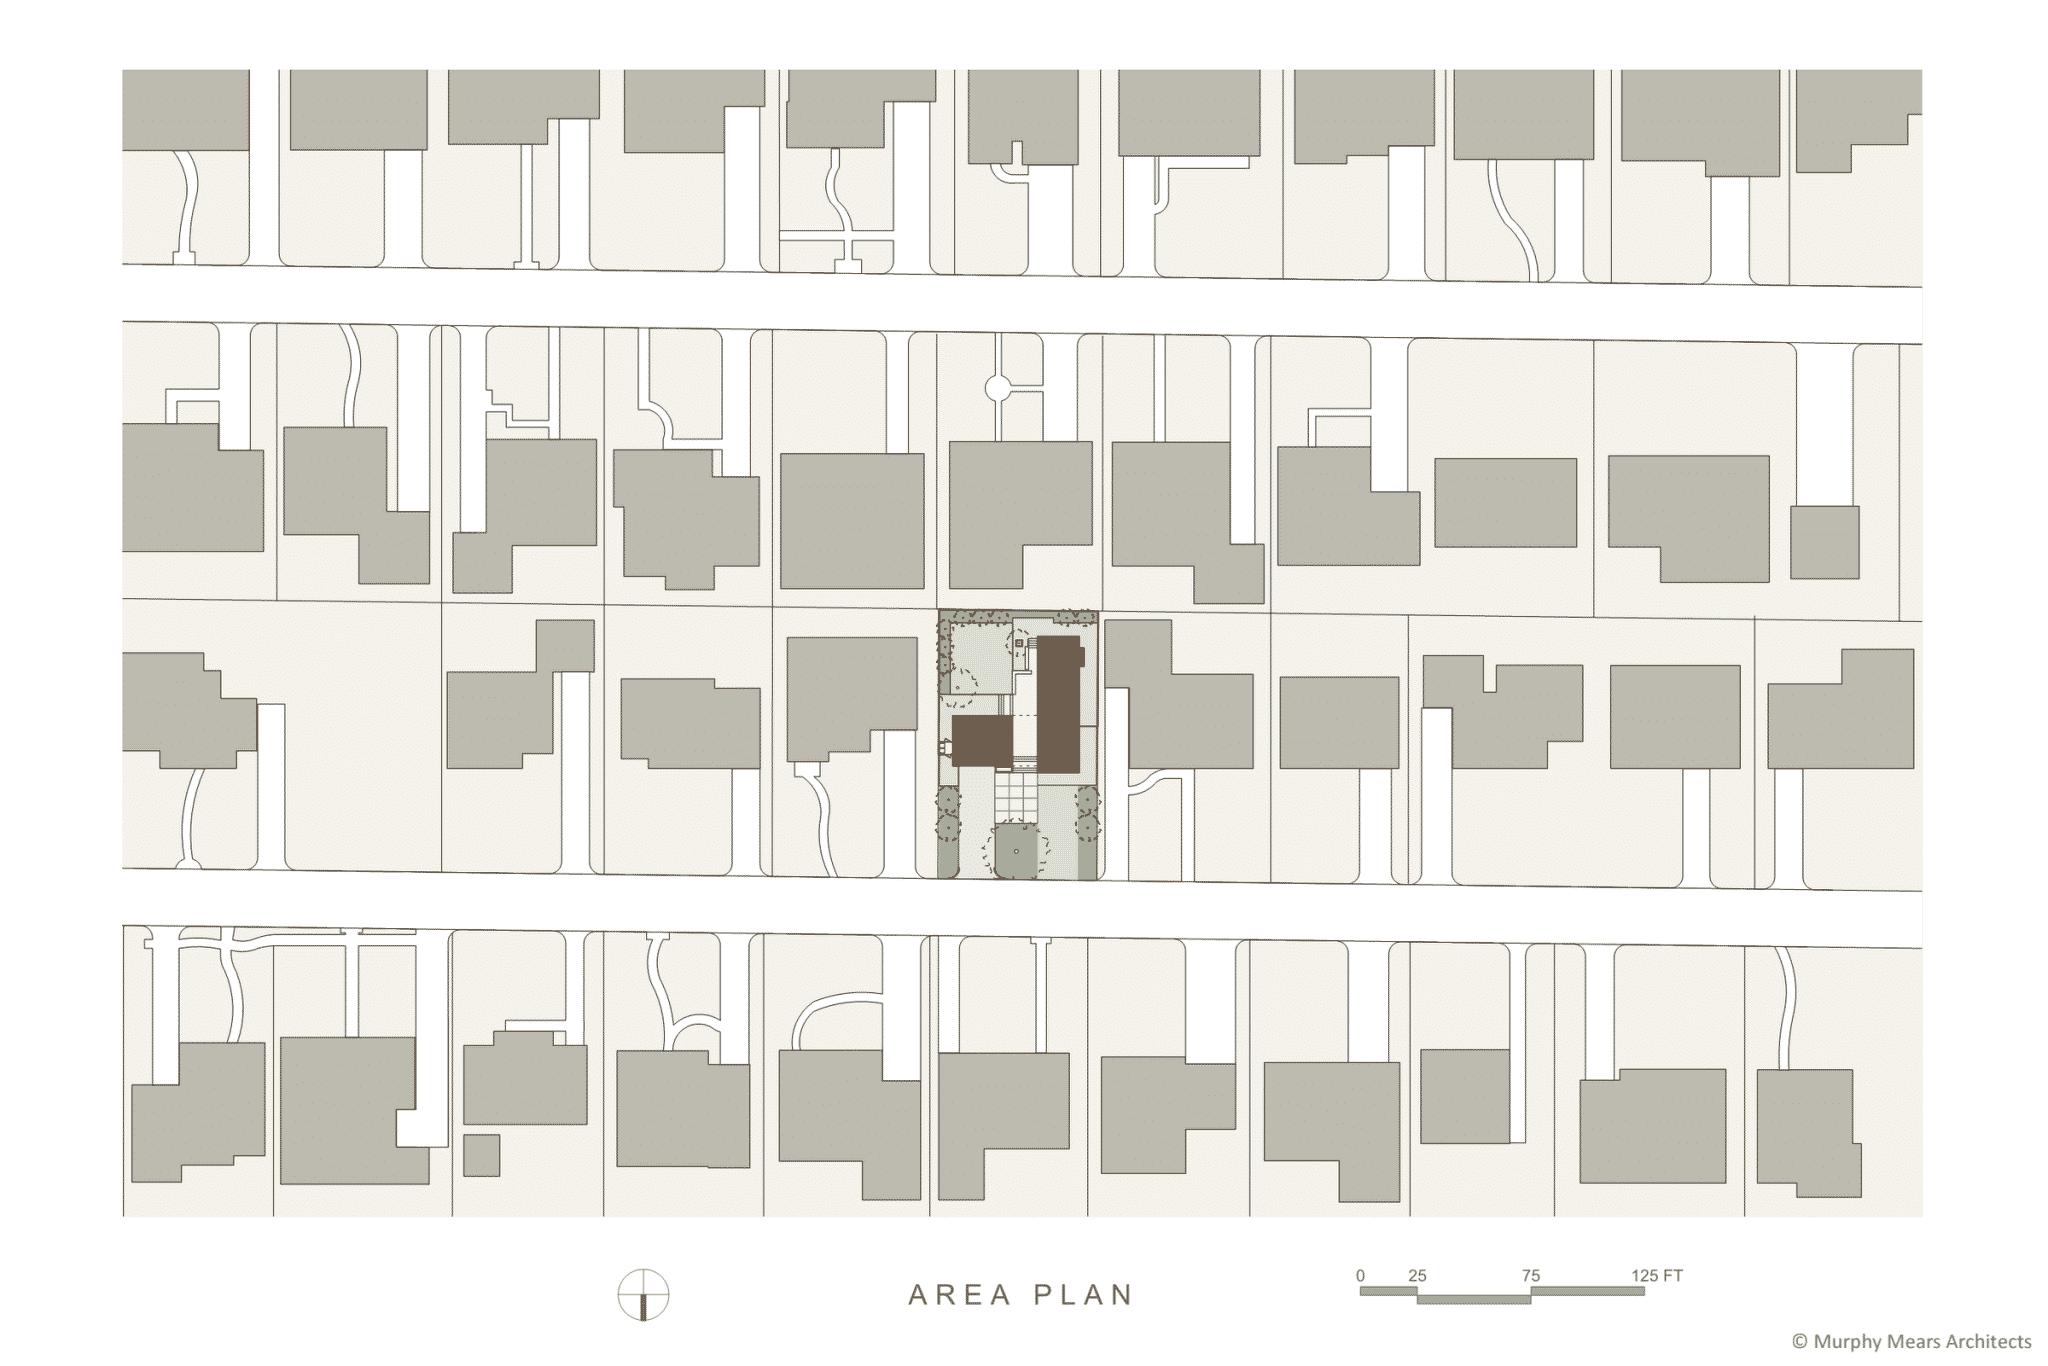 Site plan within the suburban neighborhood context.